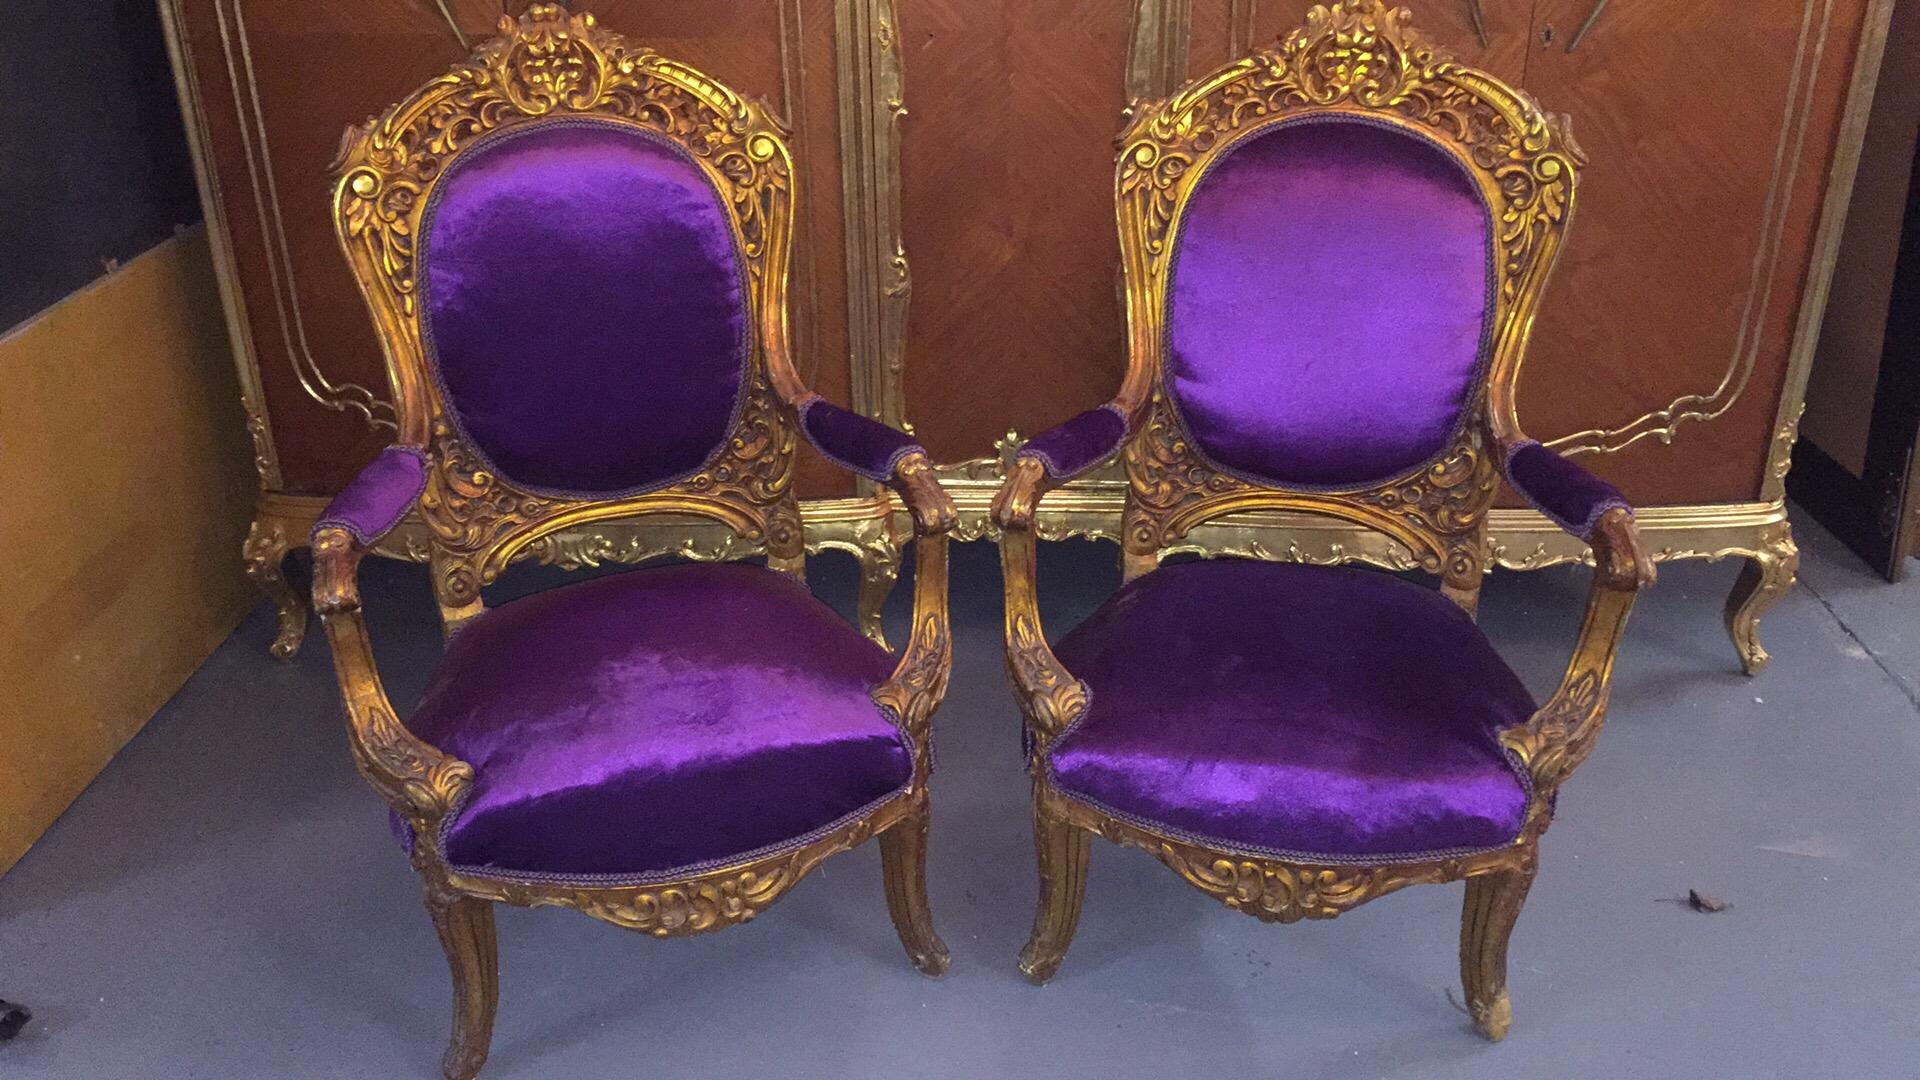 Renaissance Antique Furniture and Lighting Warehouse Dublin Ireland gilt sofa